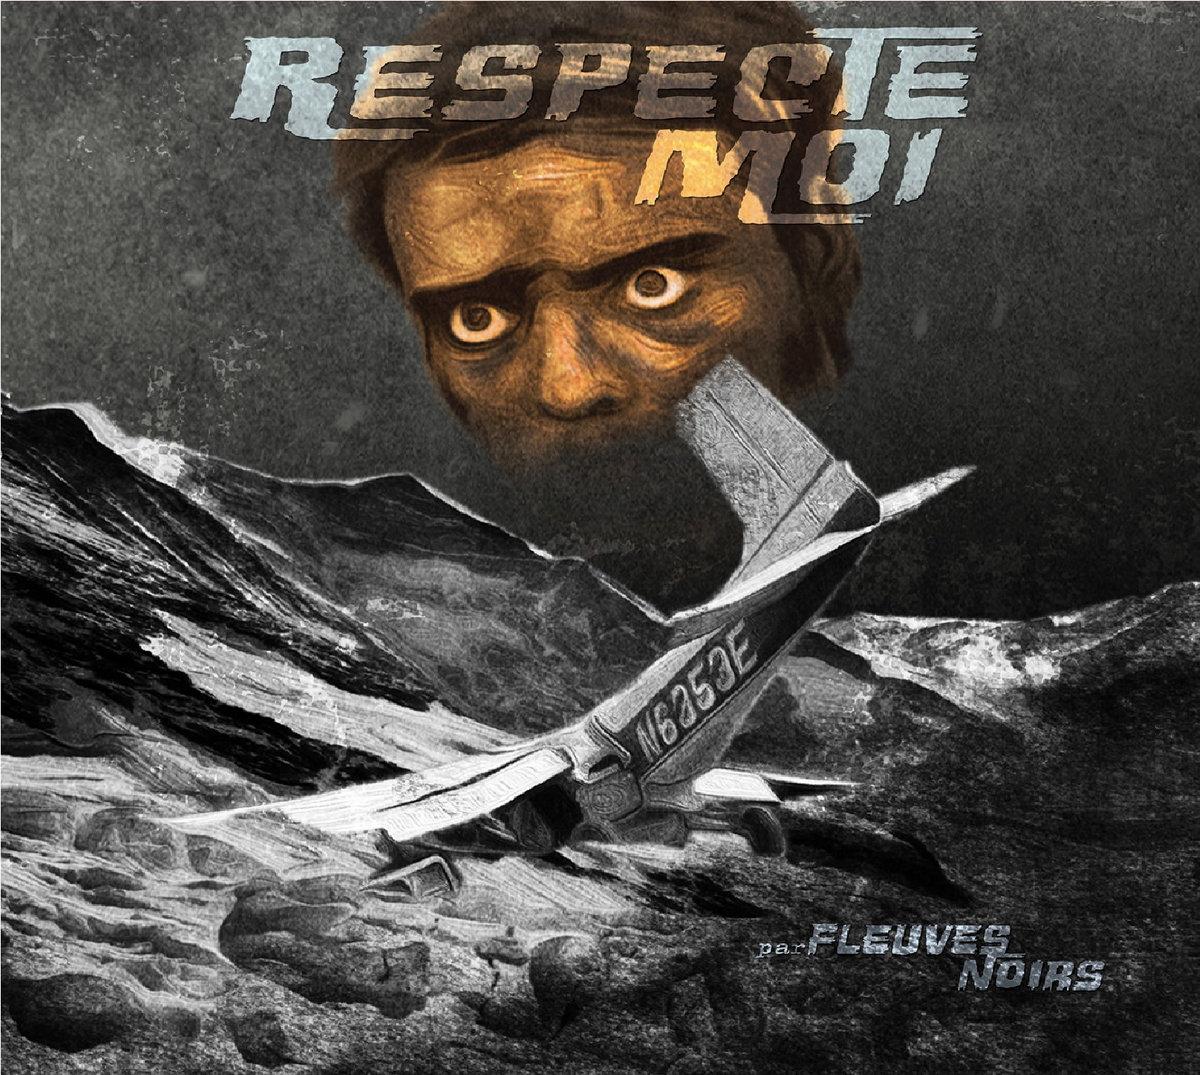 FLEUVES NOIRS - Respecte Moi